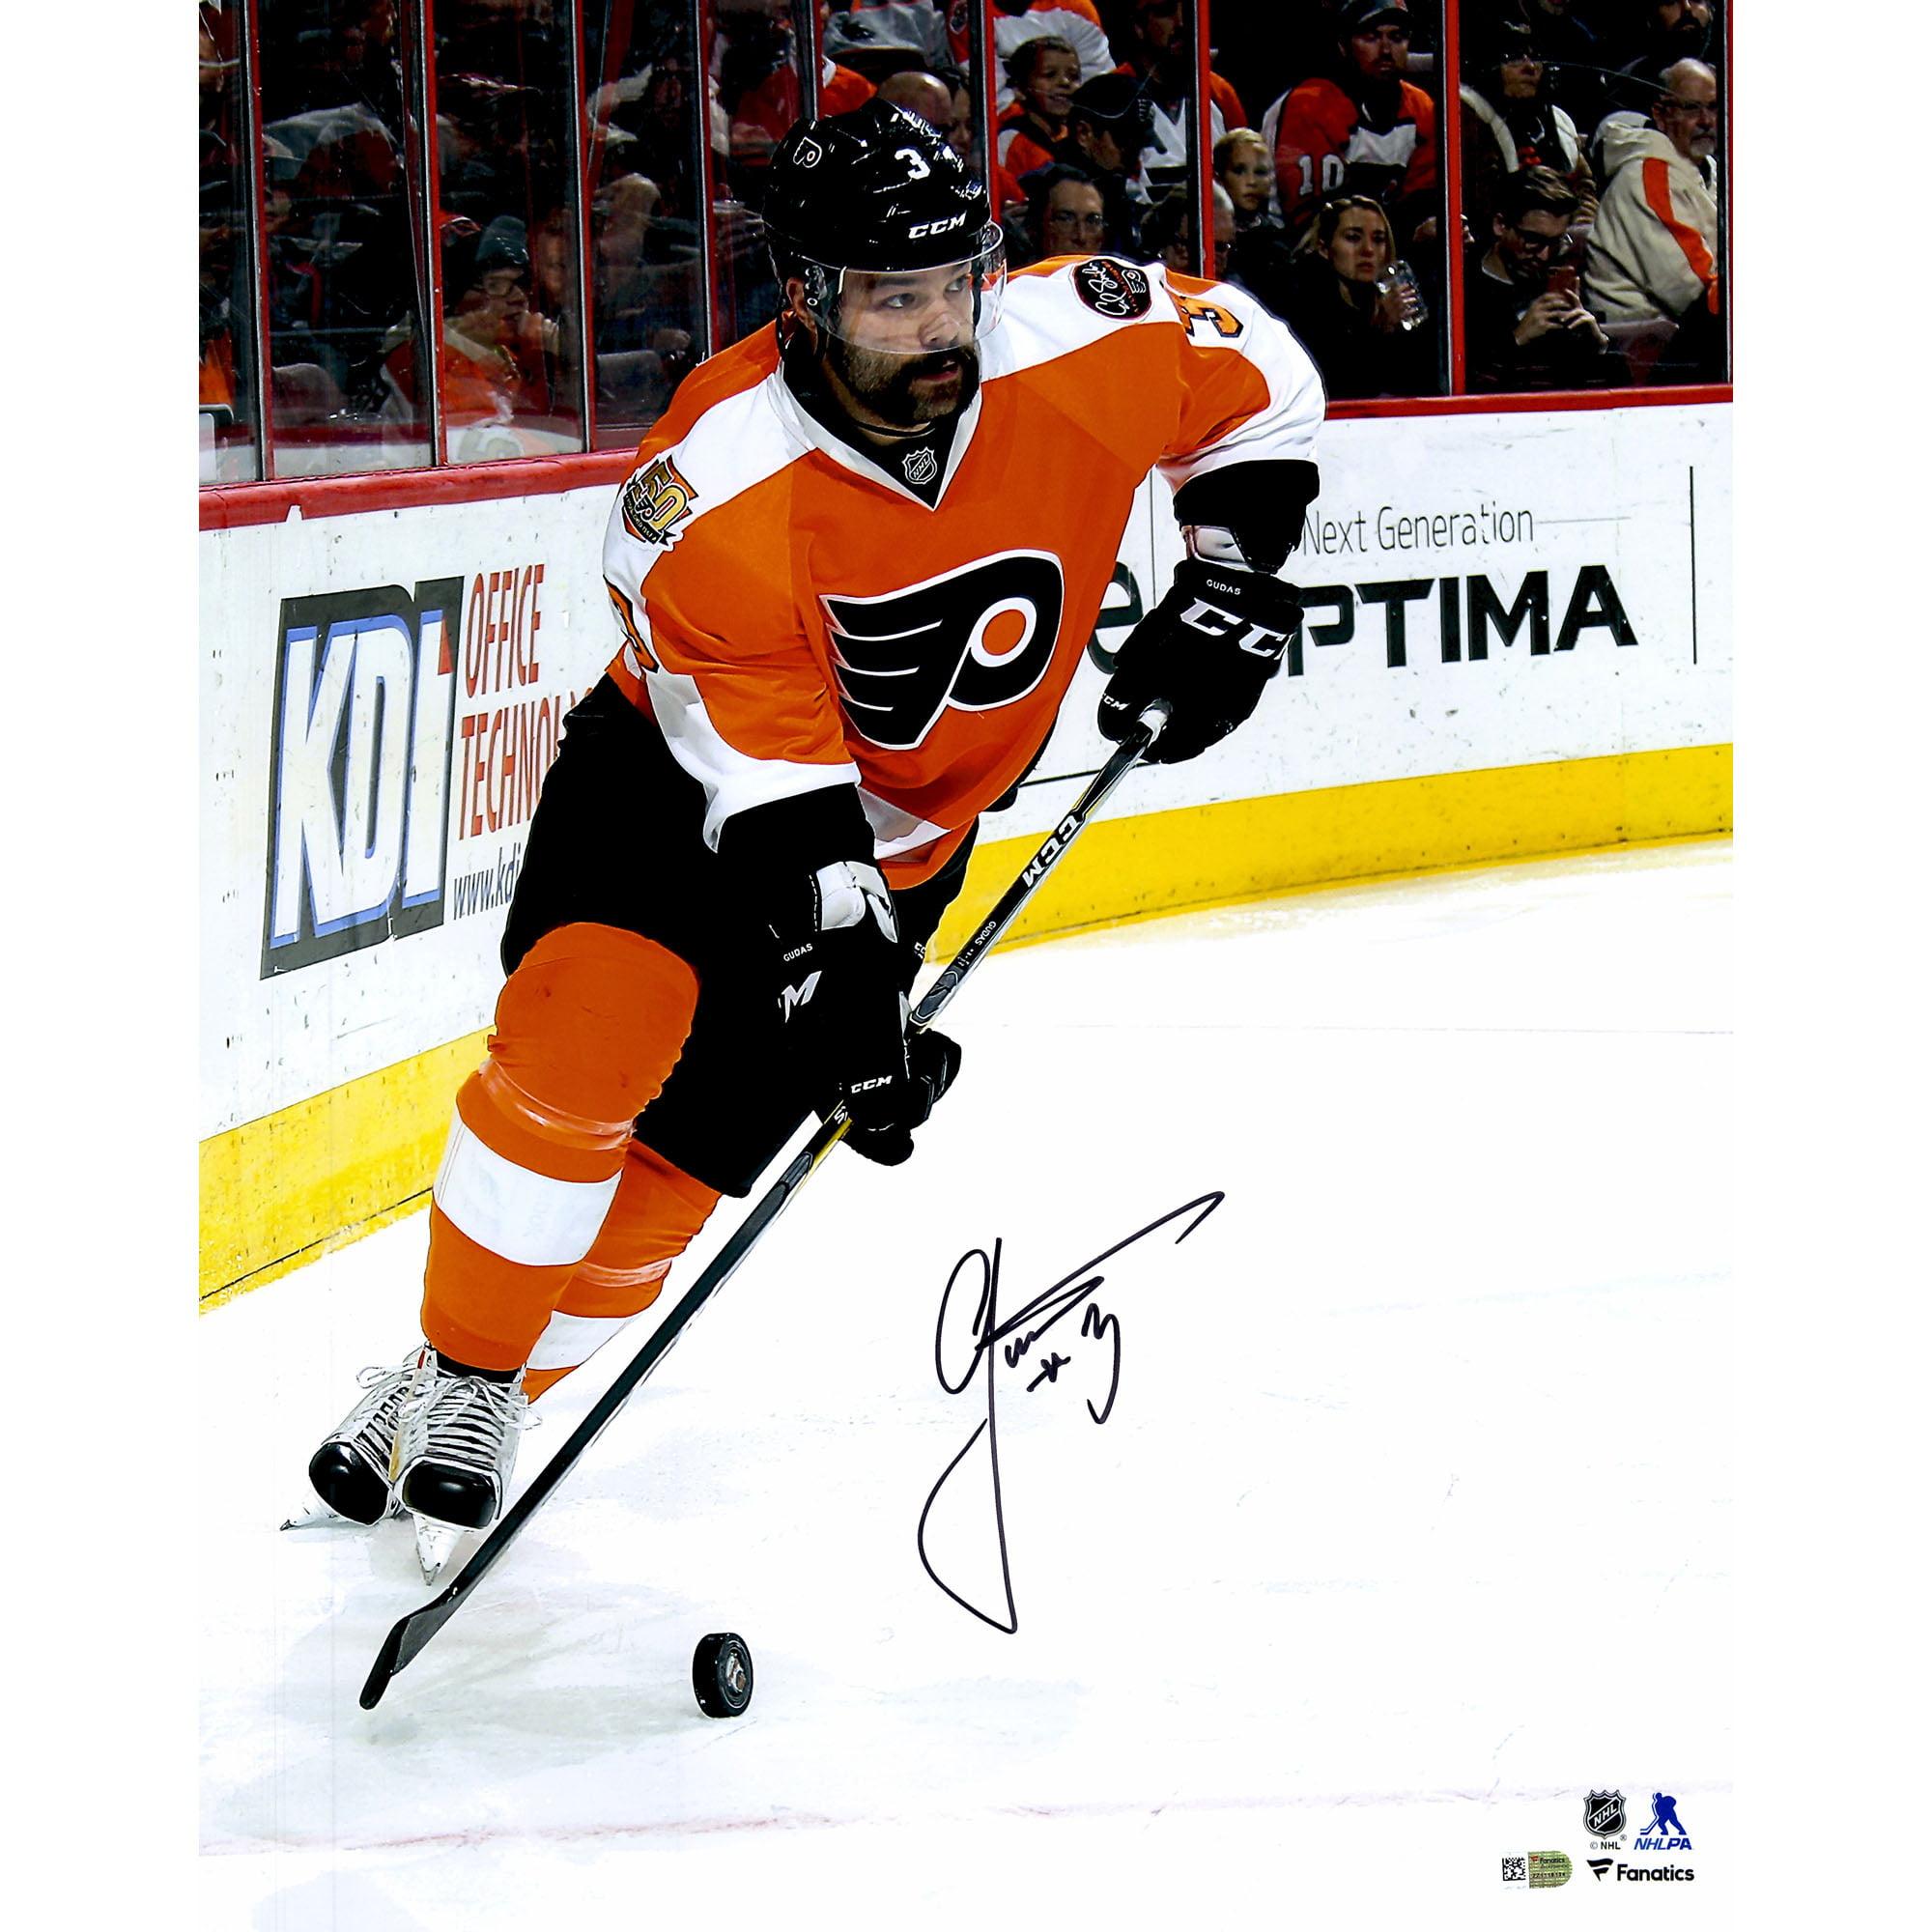 "Radko Gudas Philadelphia Flyers Fanatics Authentic Autographed 16"" x 20"" Orange Jersey Skating Photograph No... by Fanatics Authentic"